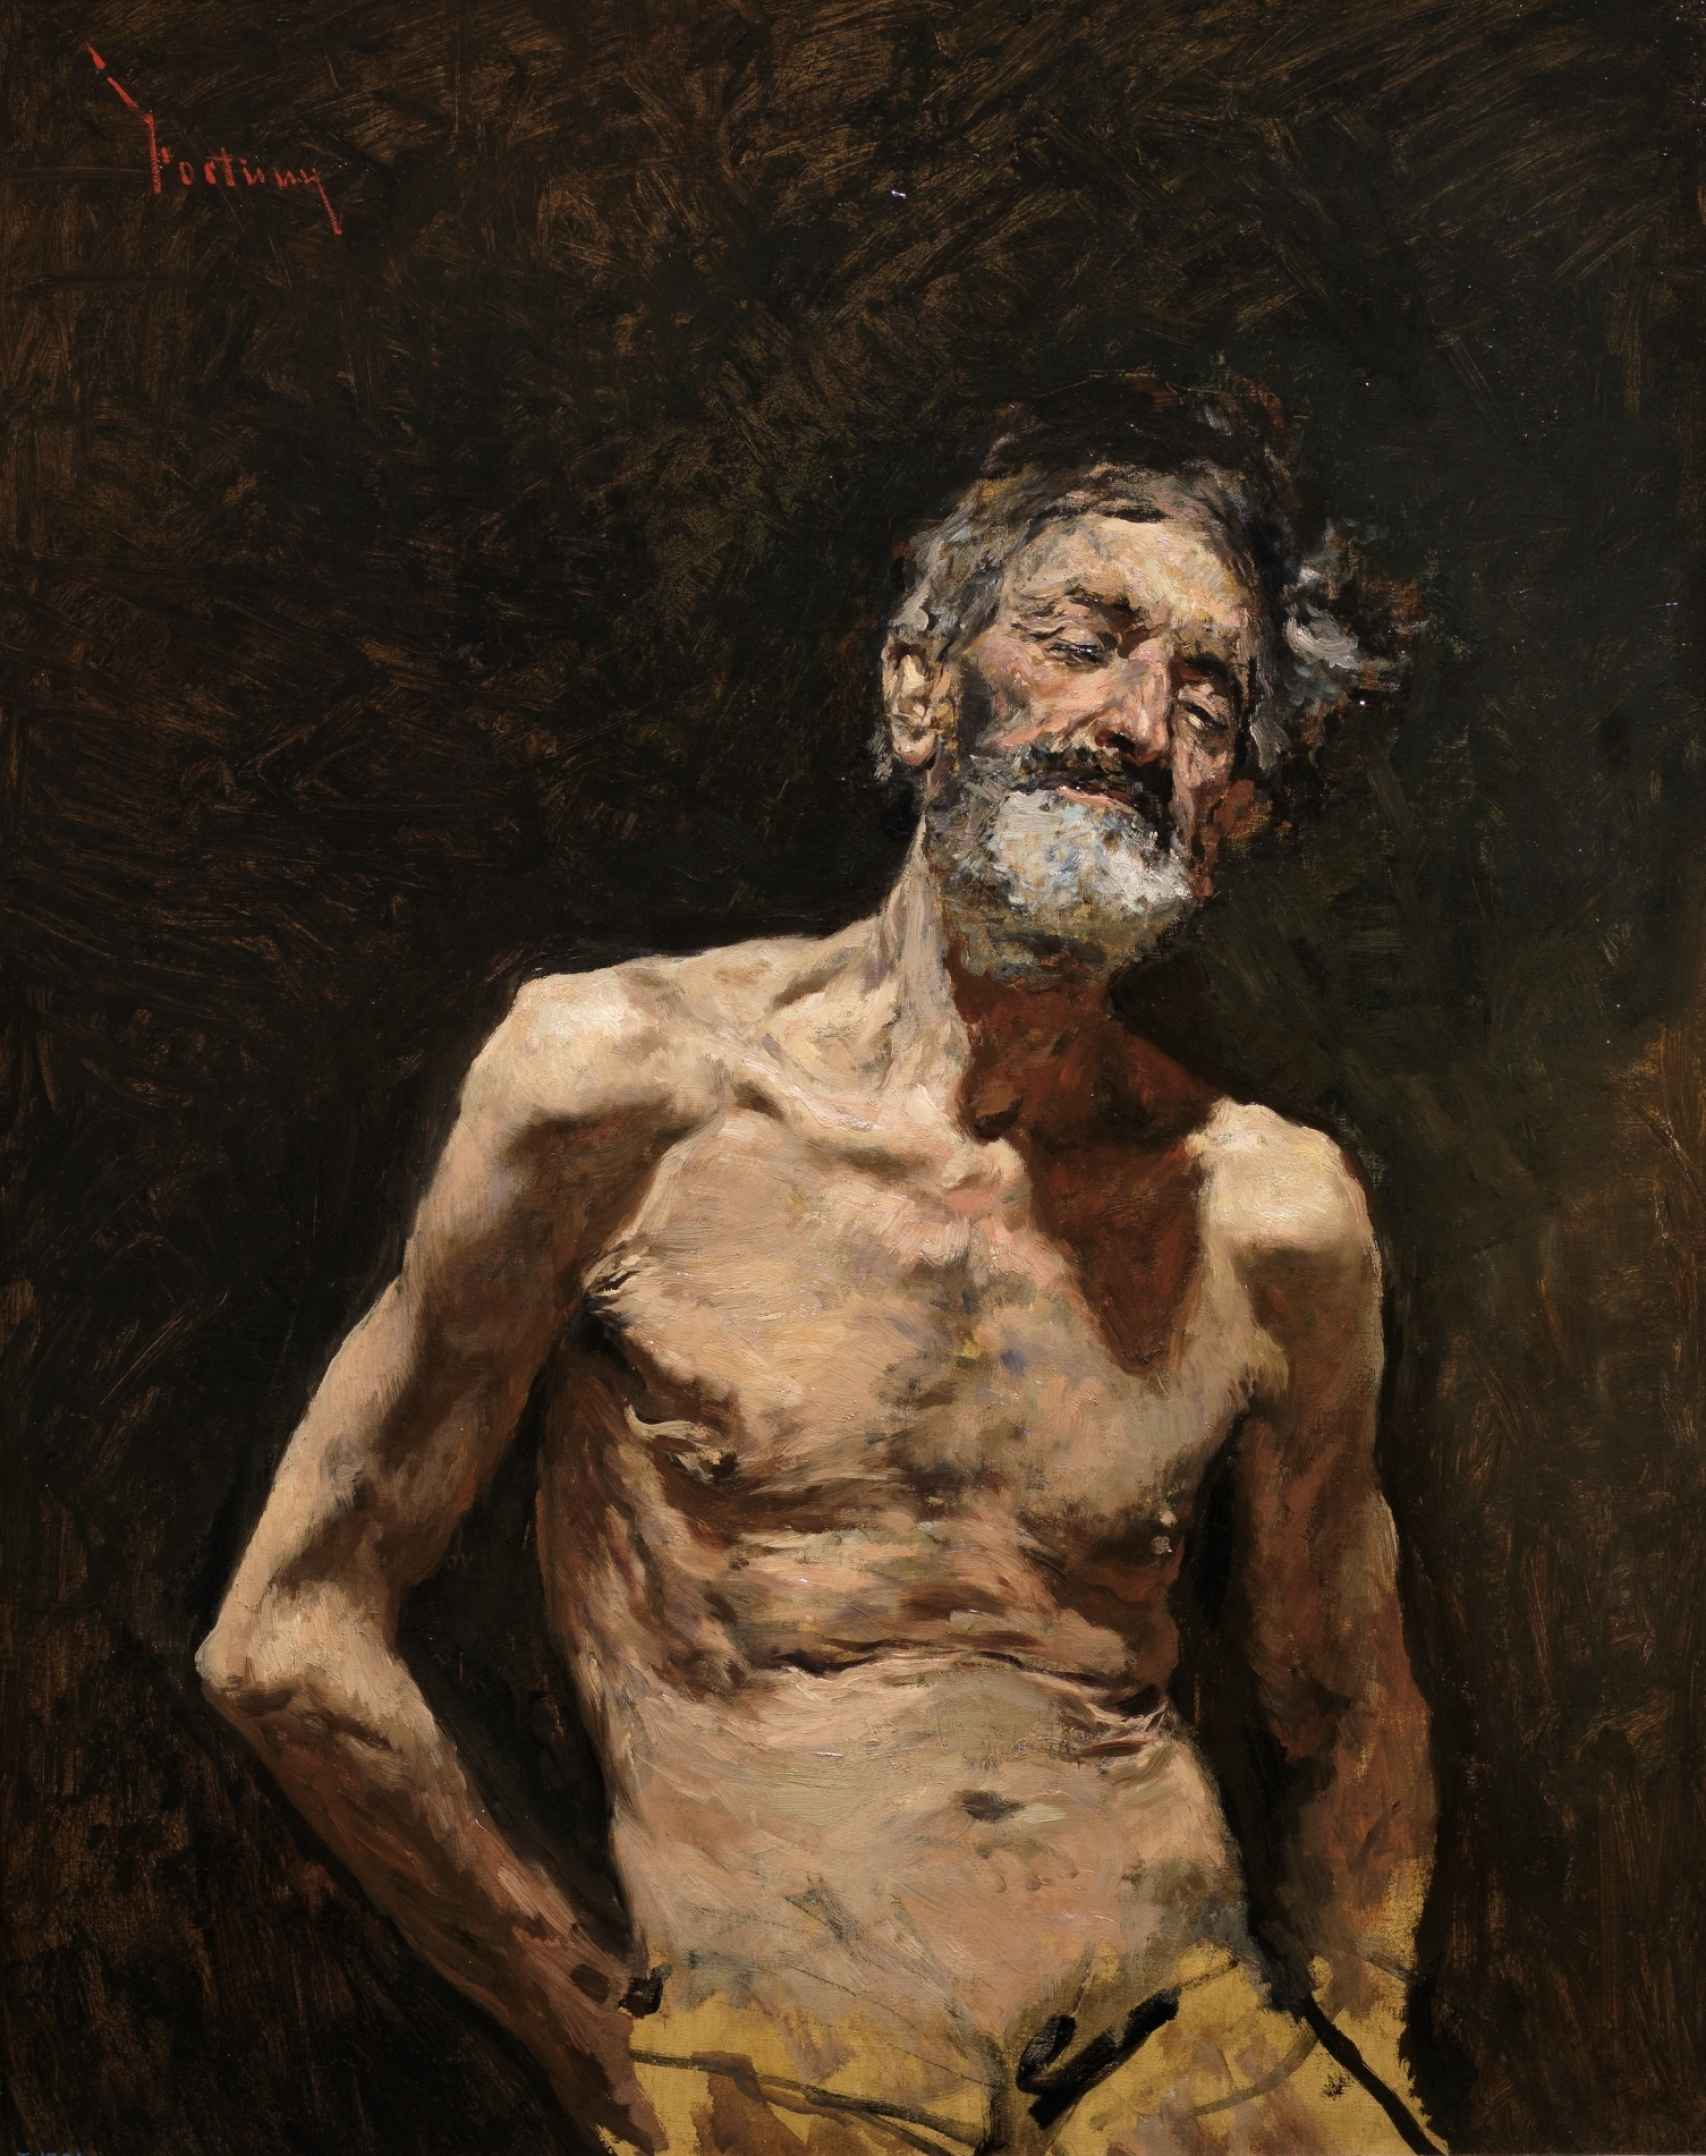 Viejo desnudo al sol, de 1871.